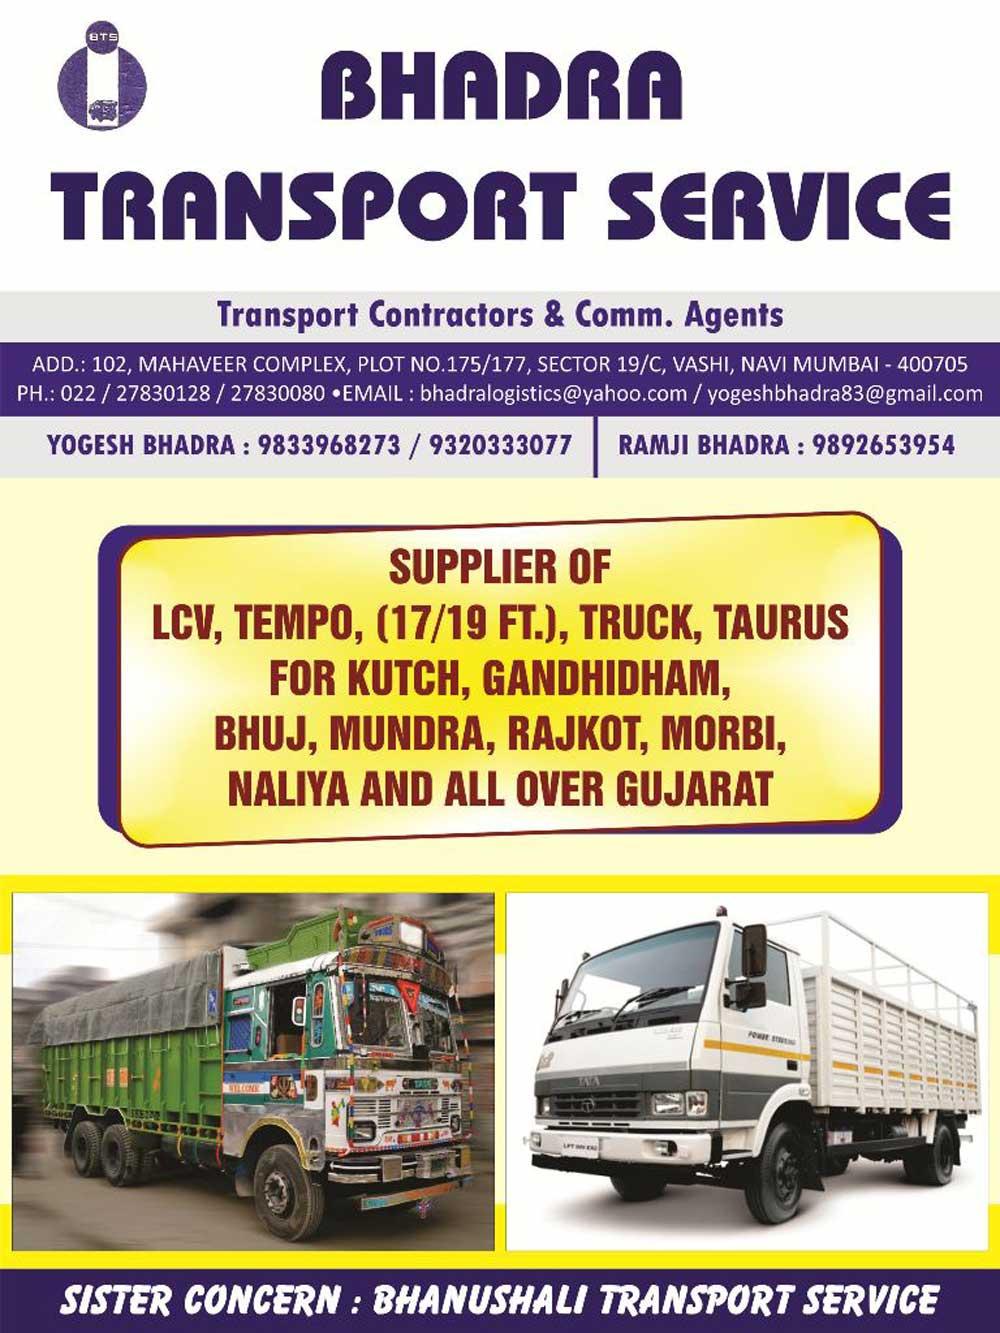 bhadra-transport-service